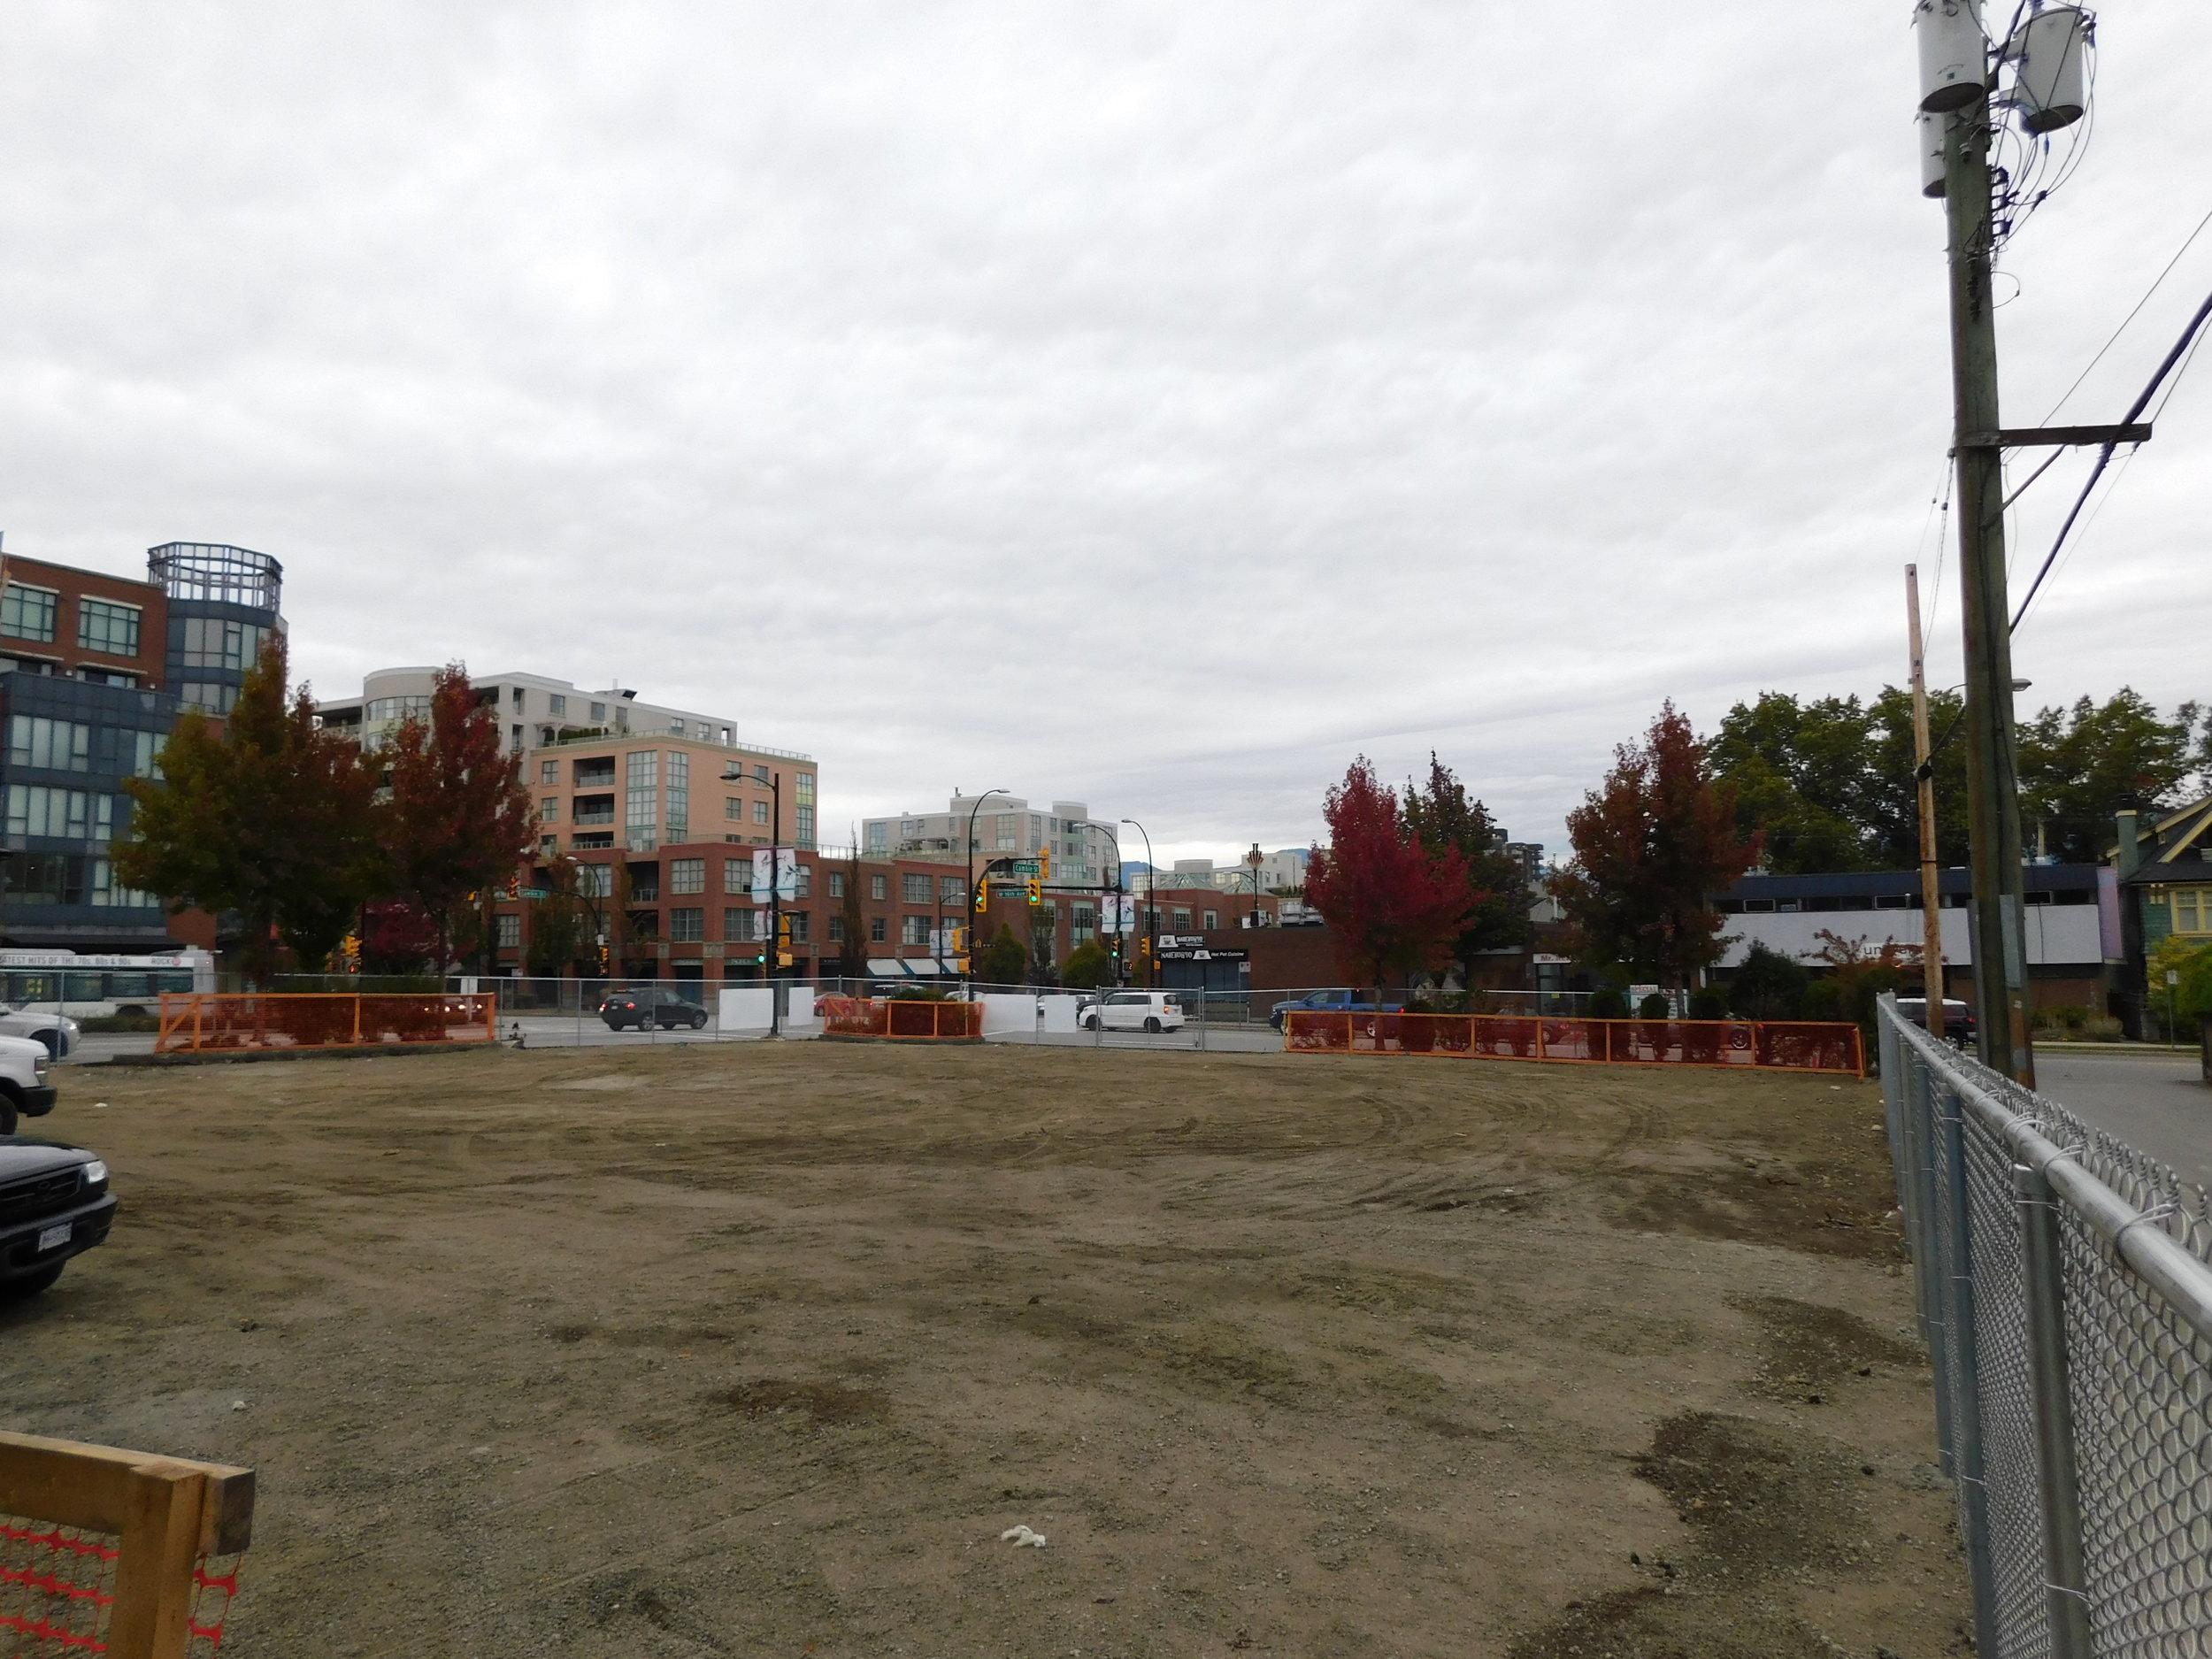 community_garden_vacant_grow_vancouver-0028.JPG